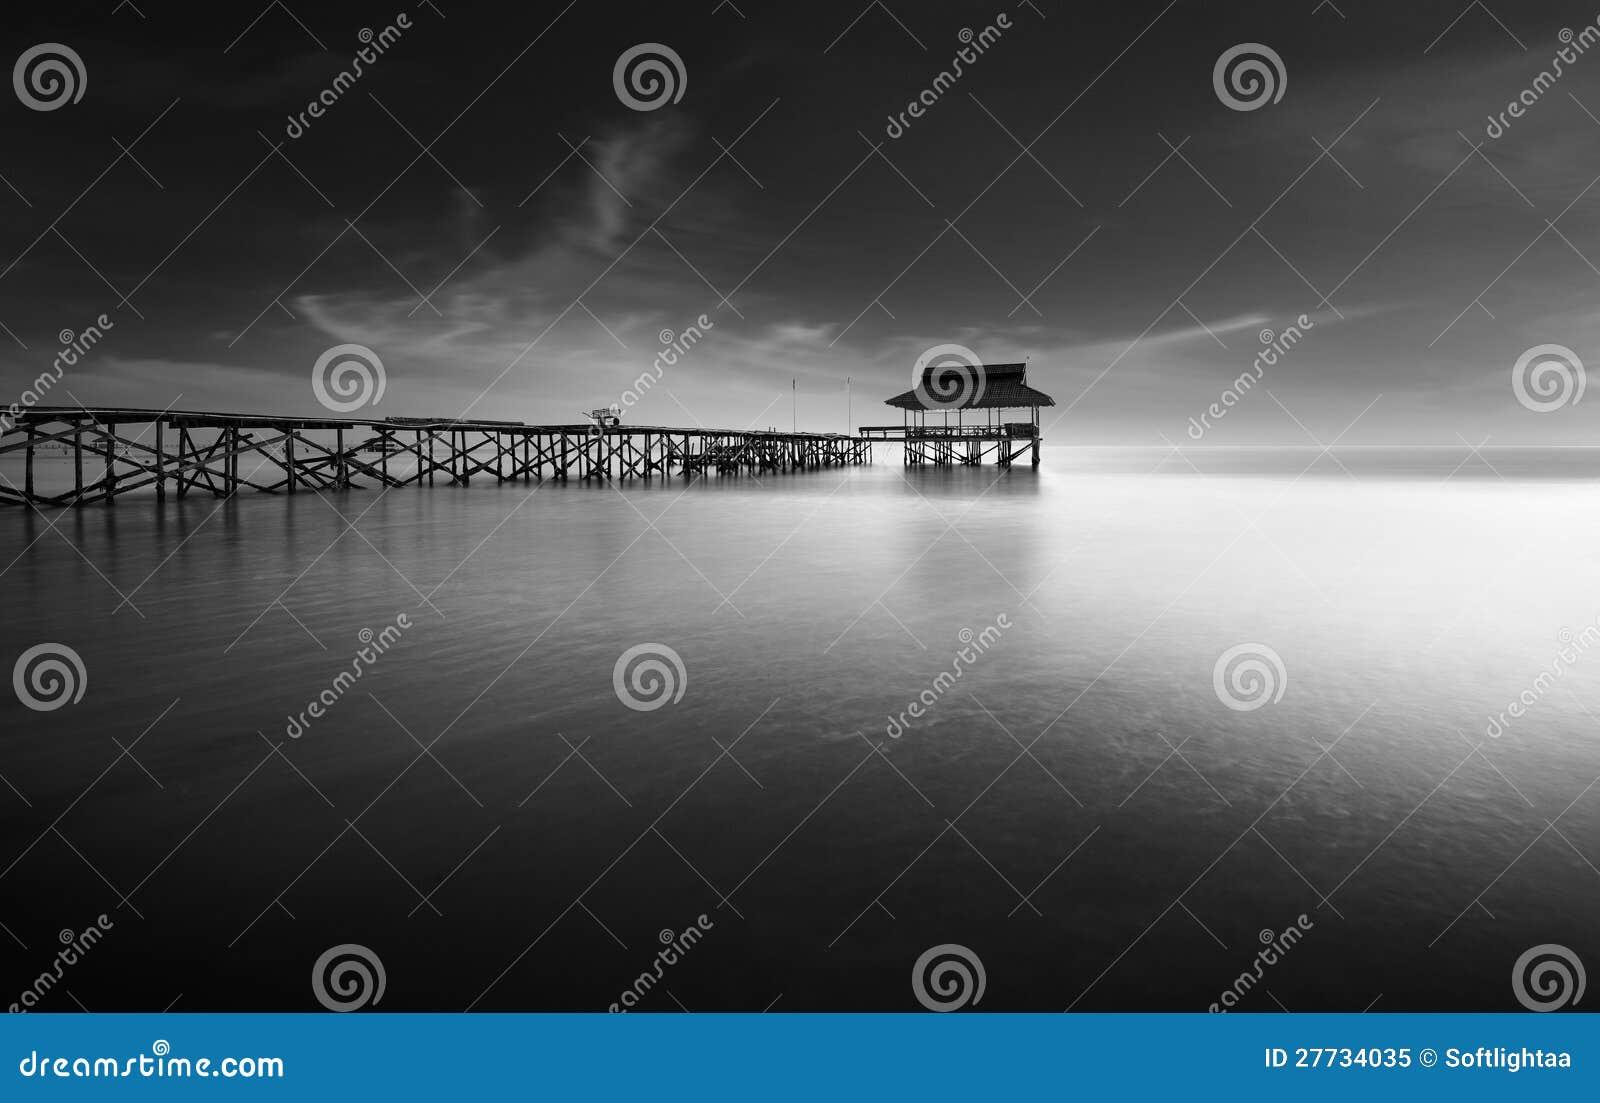 Einsamer alter Pier bei Ebbe